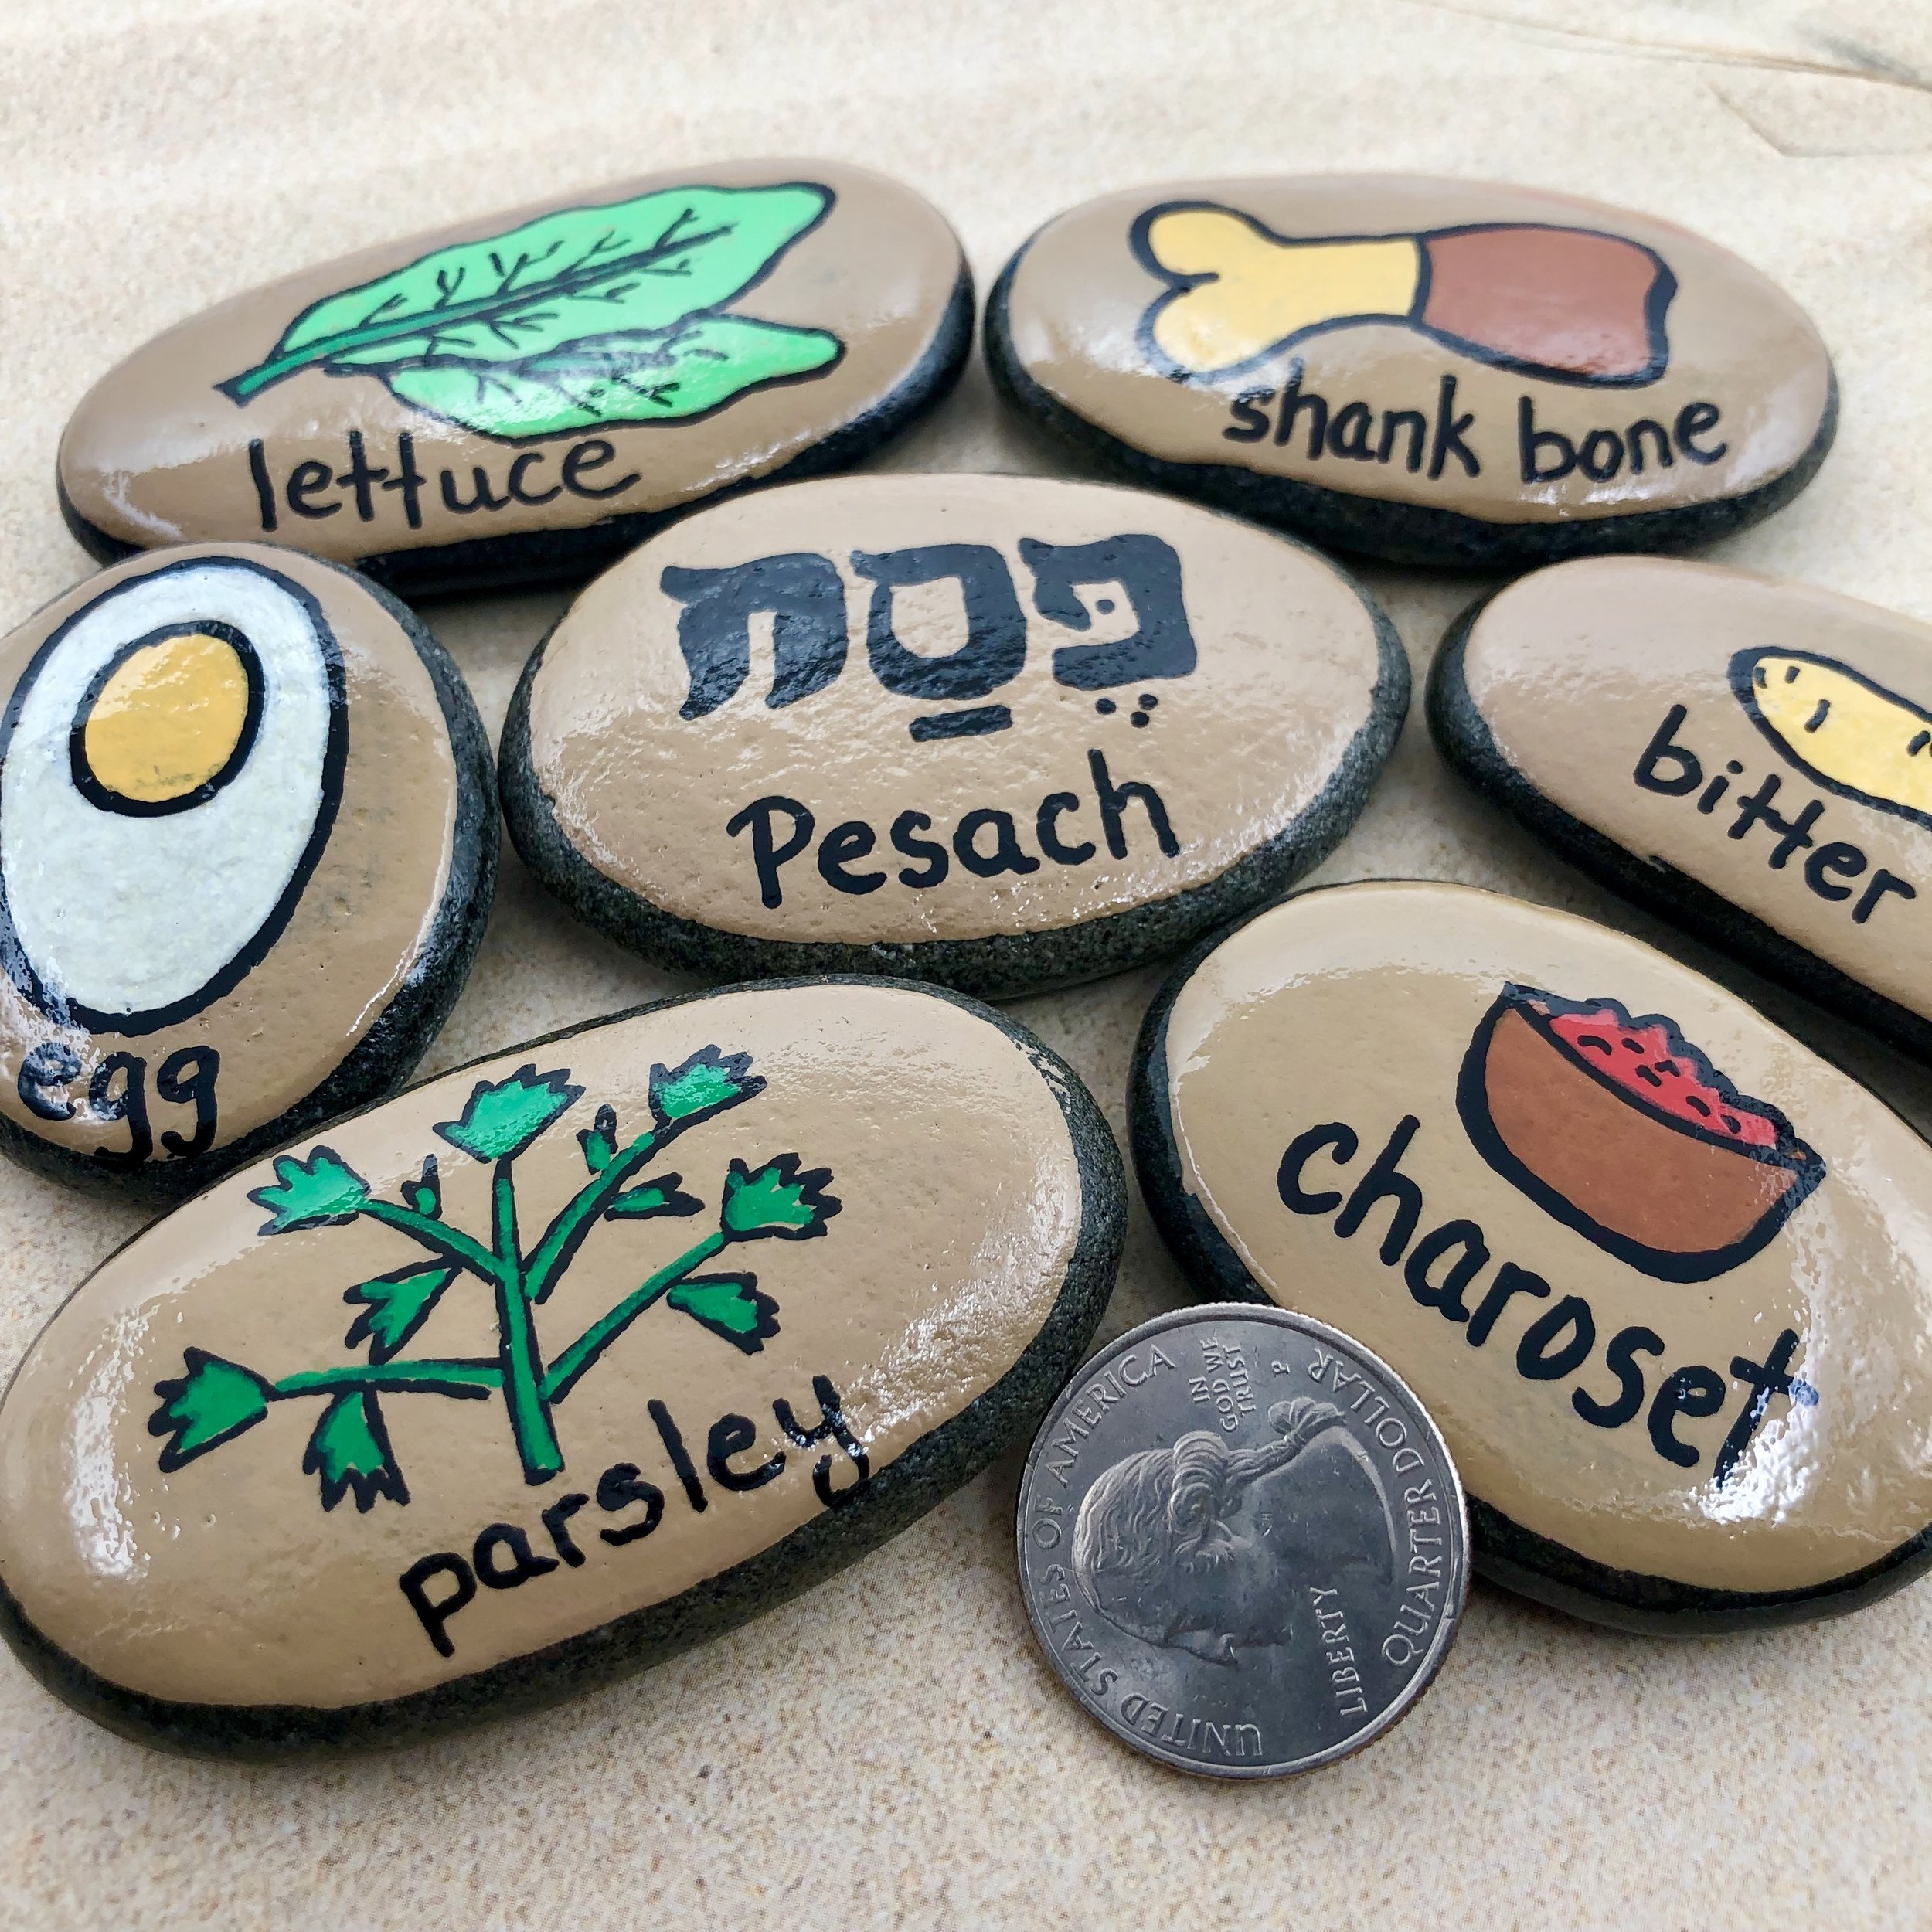 graphic about Children's Passover Seder Printable identify Pover Seder Tale Rocks, Seder Supper Tale Stones, Seder Meal Symbols, Seder Plate, Seder for Young children, Seder for Small children Alleluia Rocks